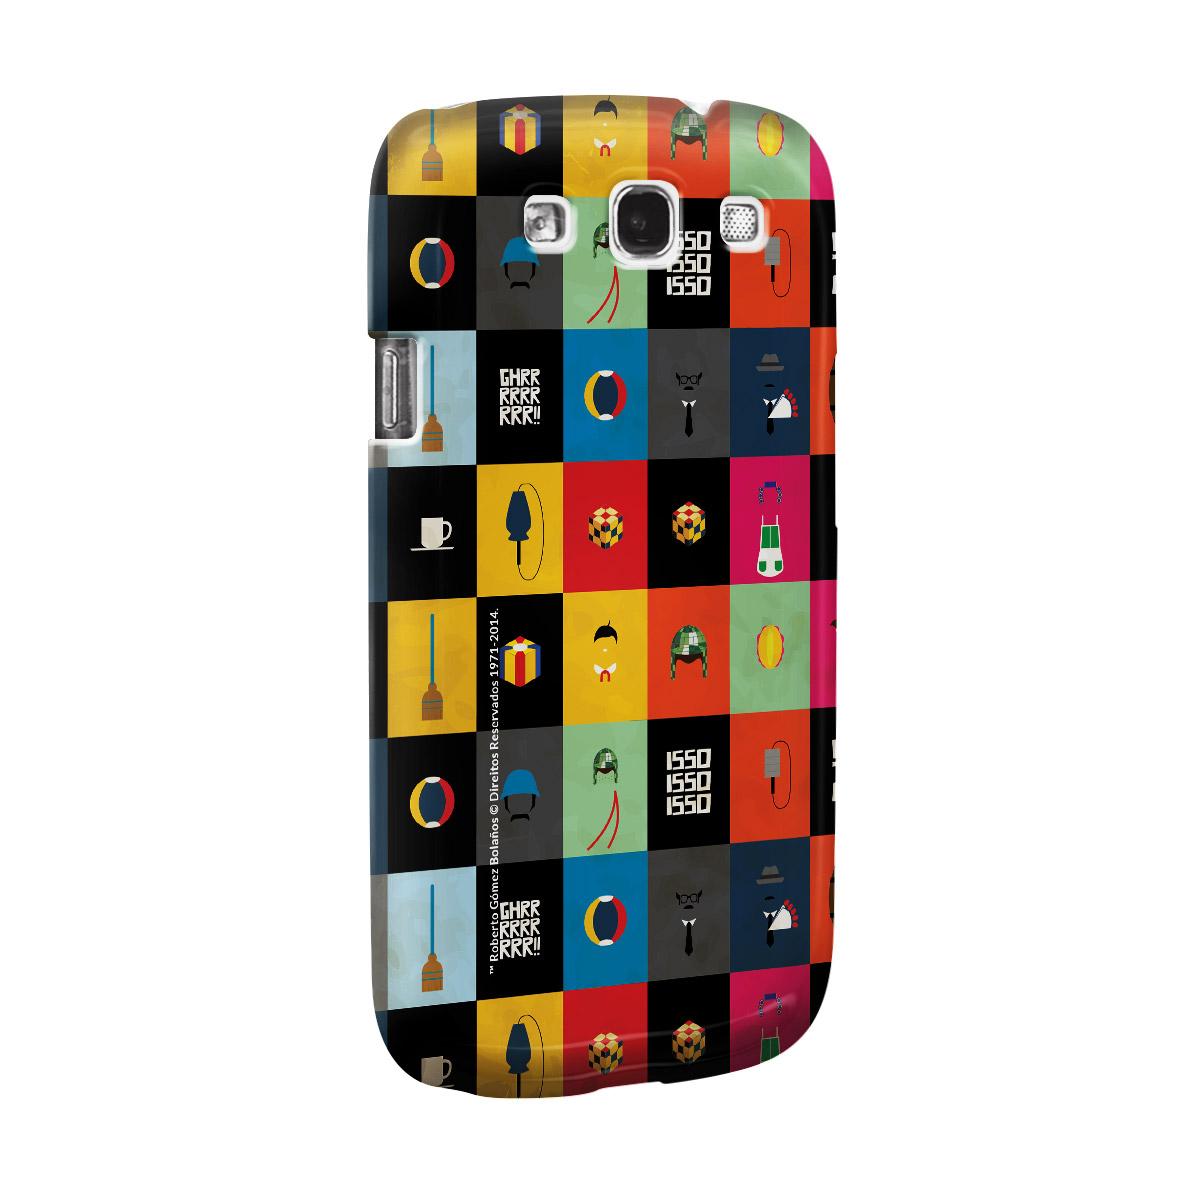 Capa de Celular Samsung Galaxy S3 Chaves Ícones Turma do Chaves Vintage